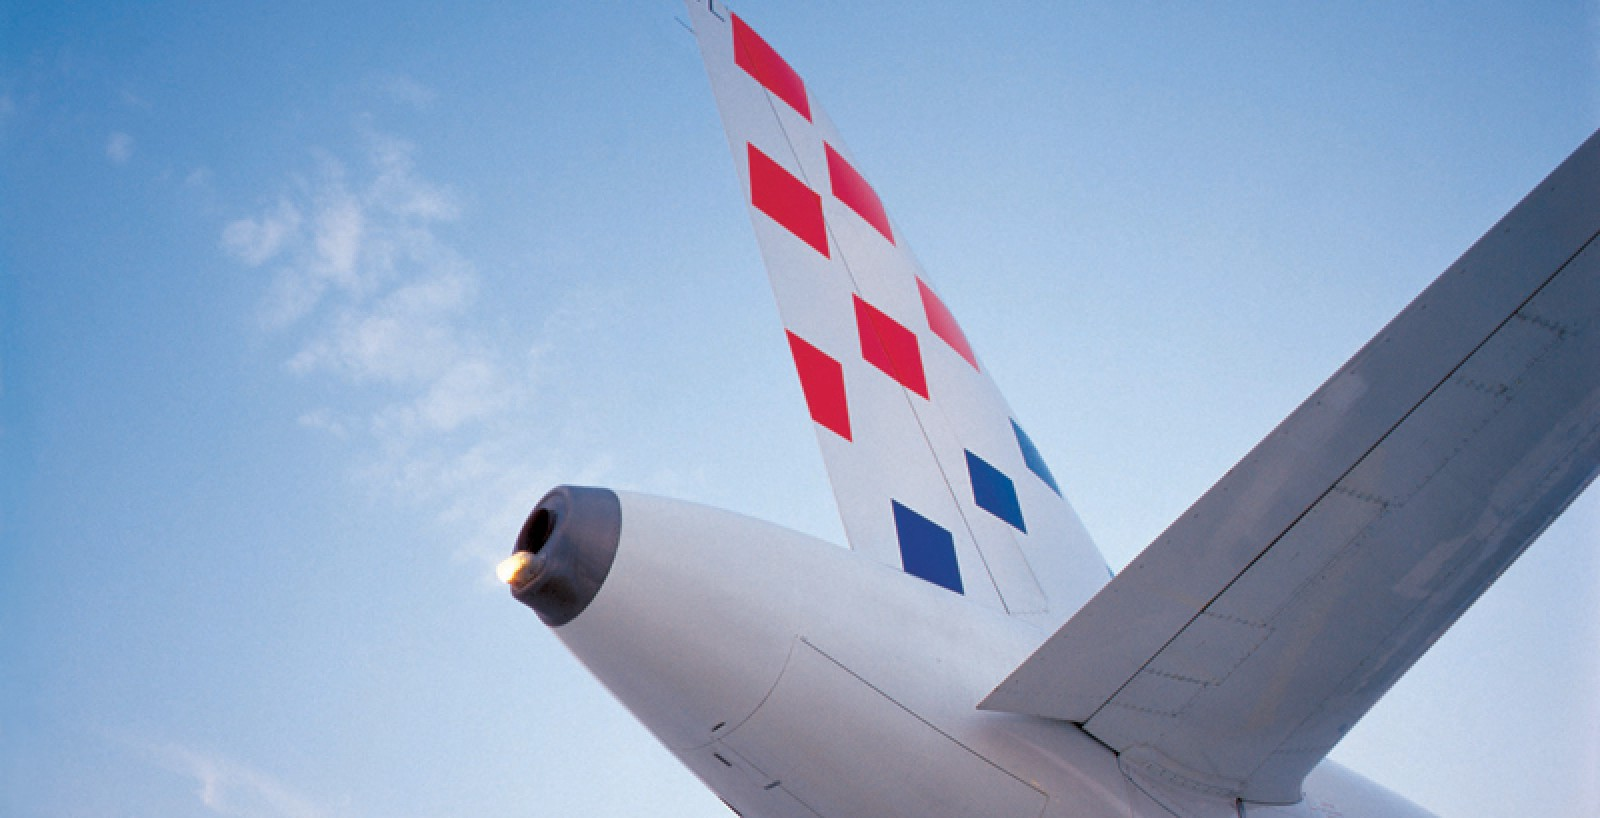 Međunarodna zračna luka Zagreb